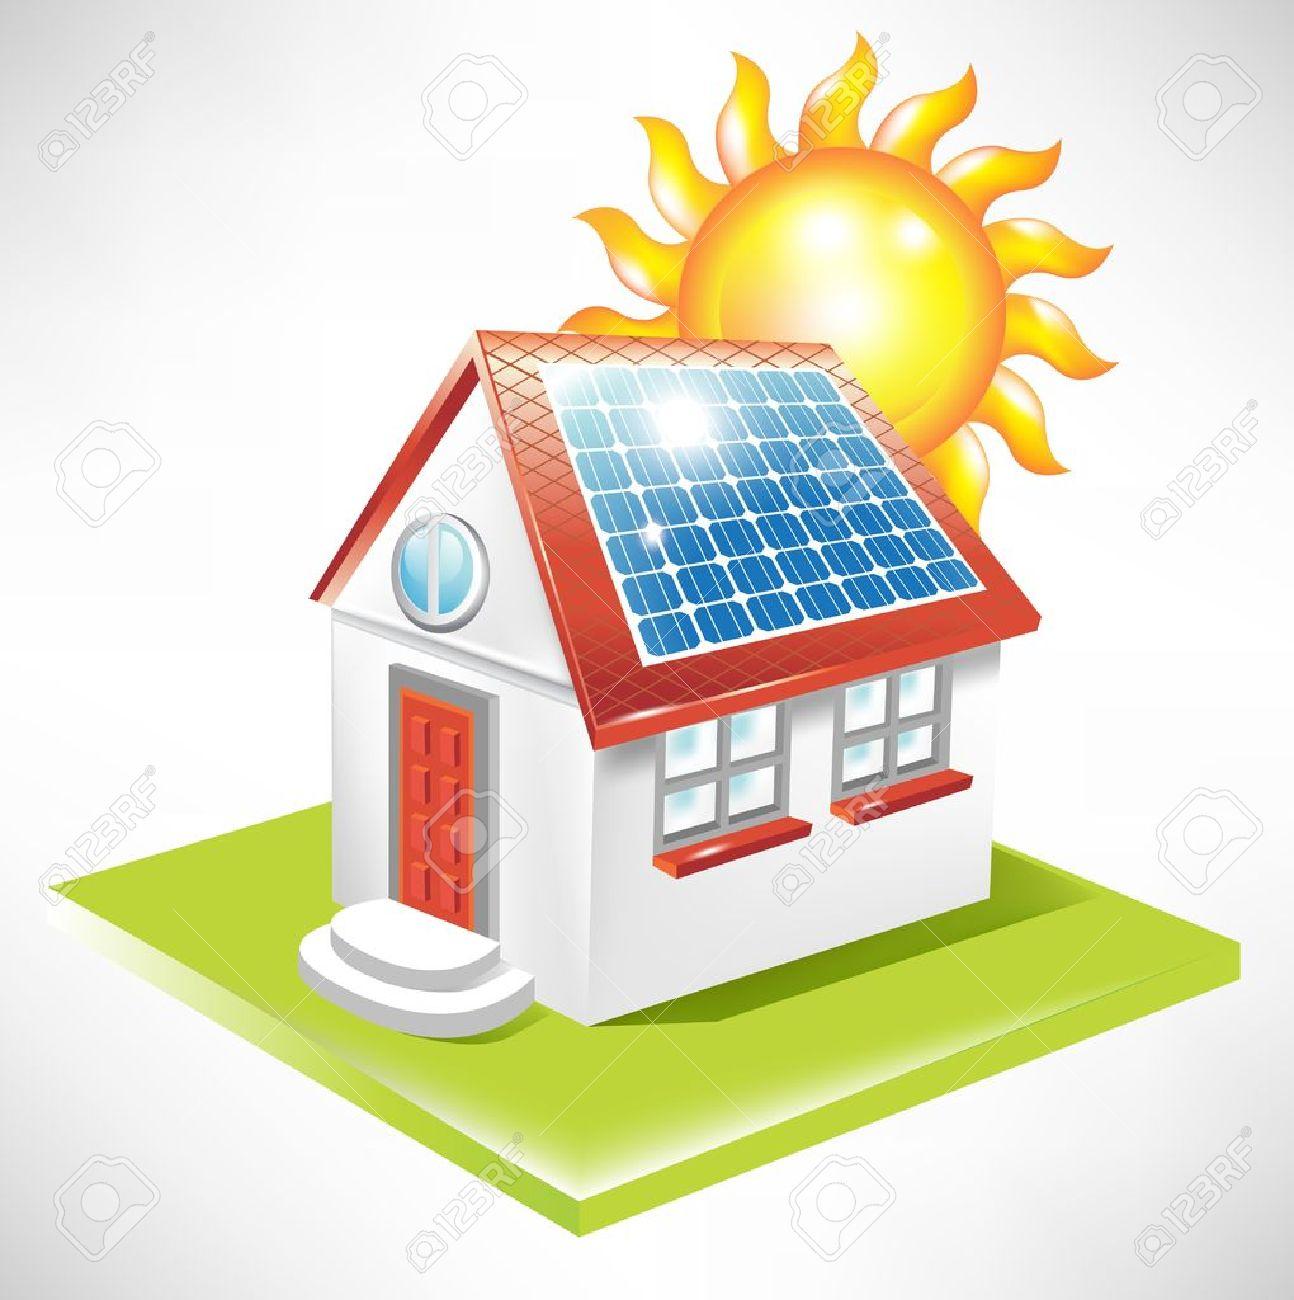 house with solar panel; alternative energy icon.